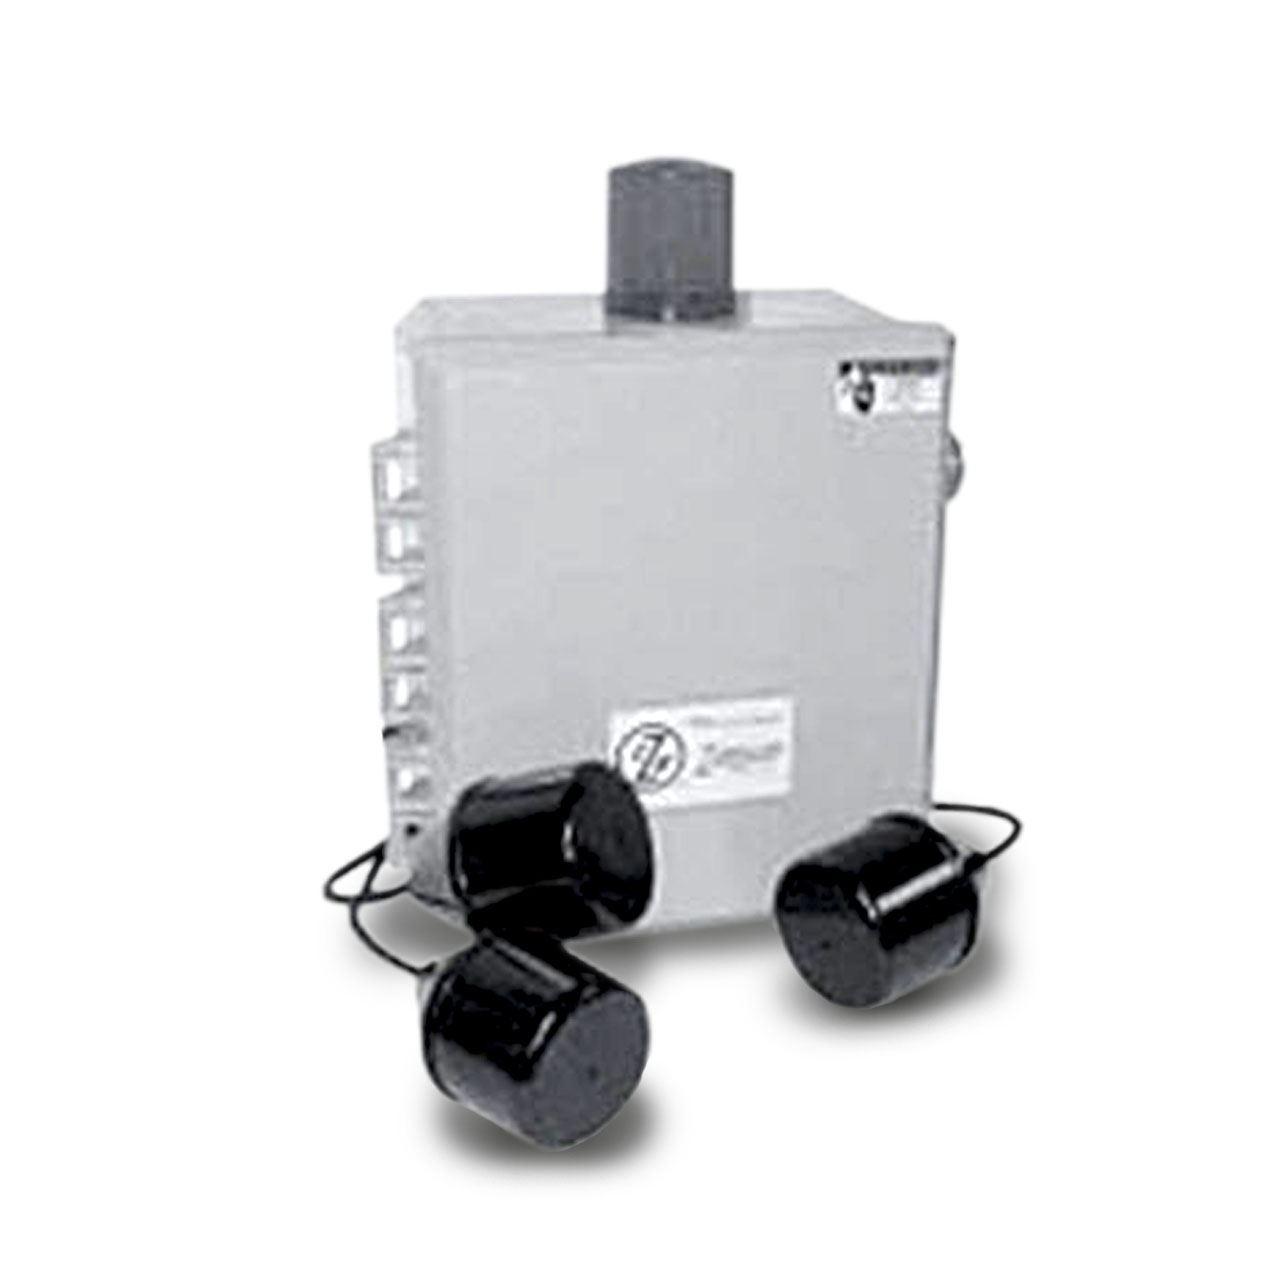 zoeller duplex pump control panel wiring diagram gibson p90 pickup 10 0399 model g840 shark auto reversing circuit 460v 3ph prev next